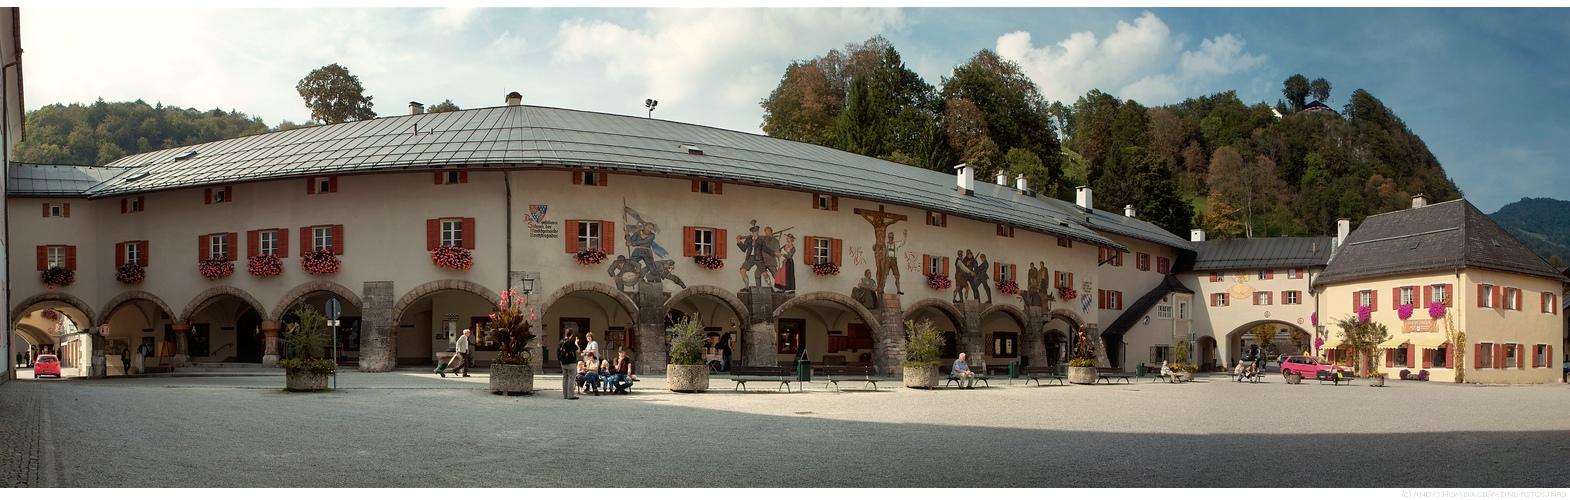 BGL - Schlossplatz